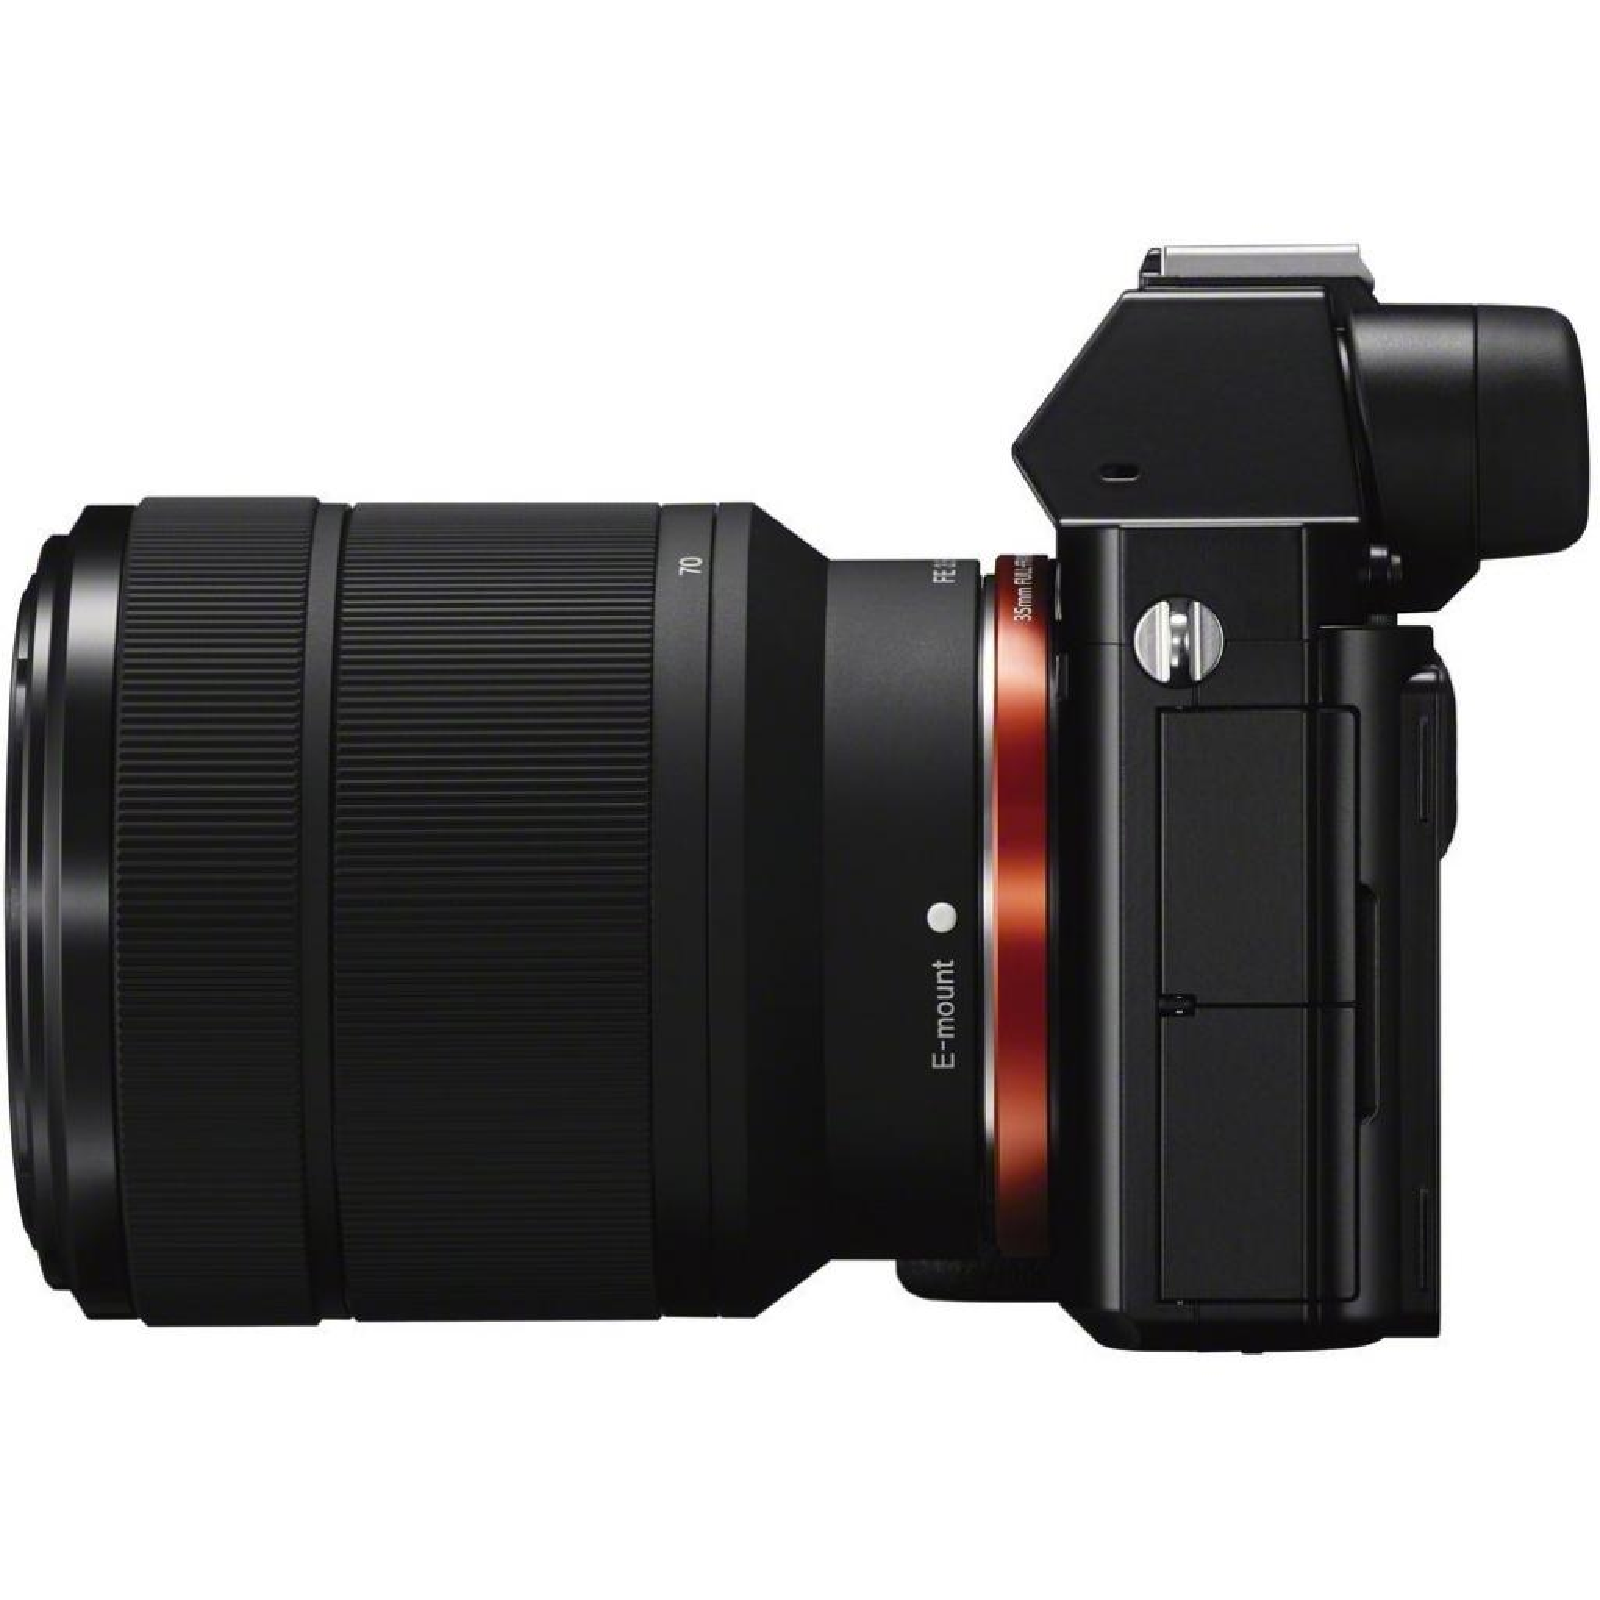 Цифровой фотоаппарат SONY Alpha 7 28-70 kit black (ILCE7KB.RU2) изображение 6